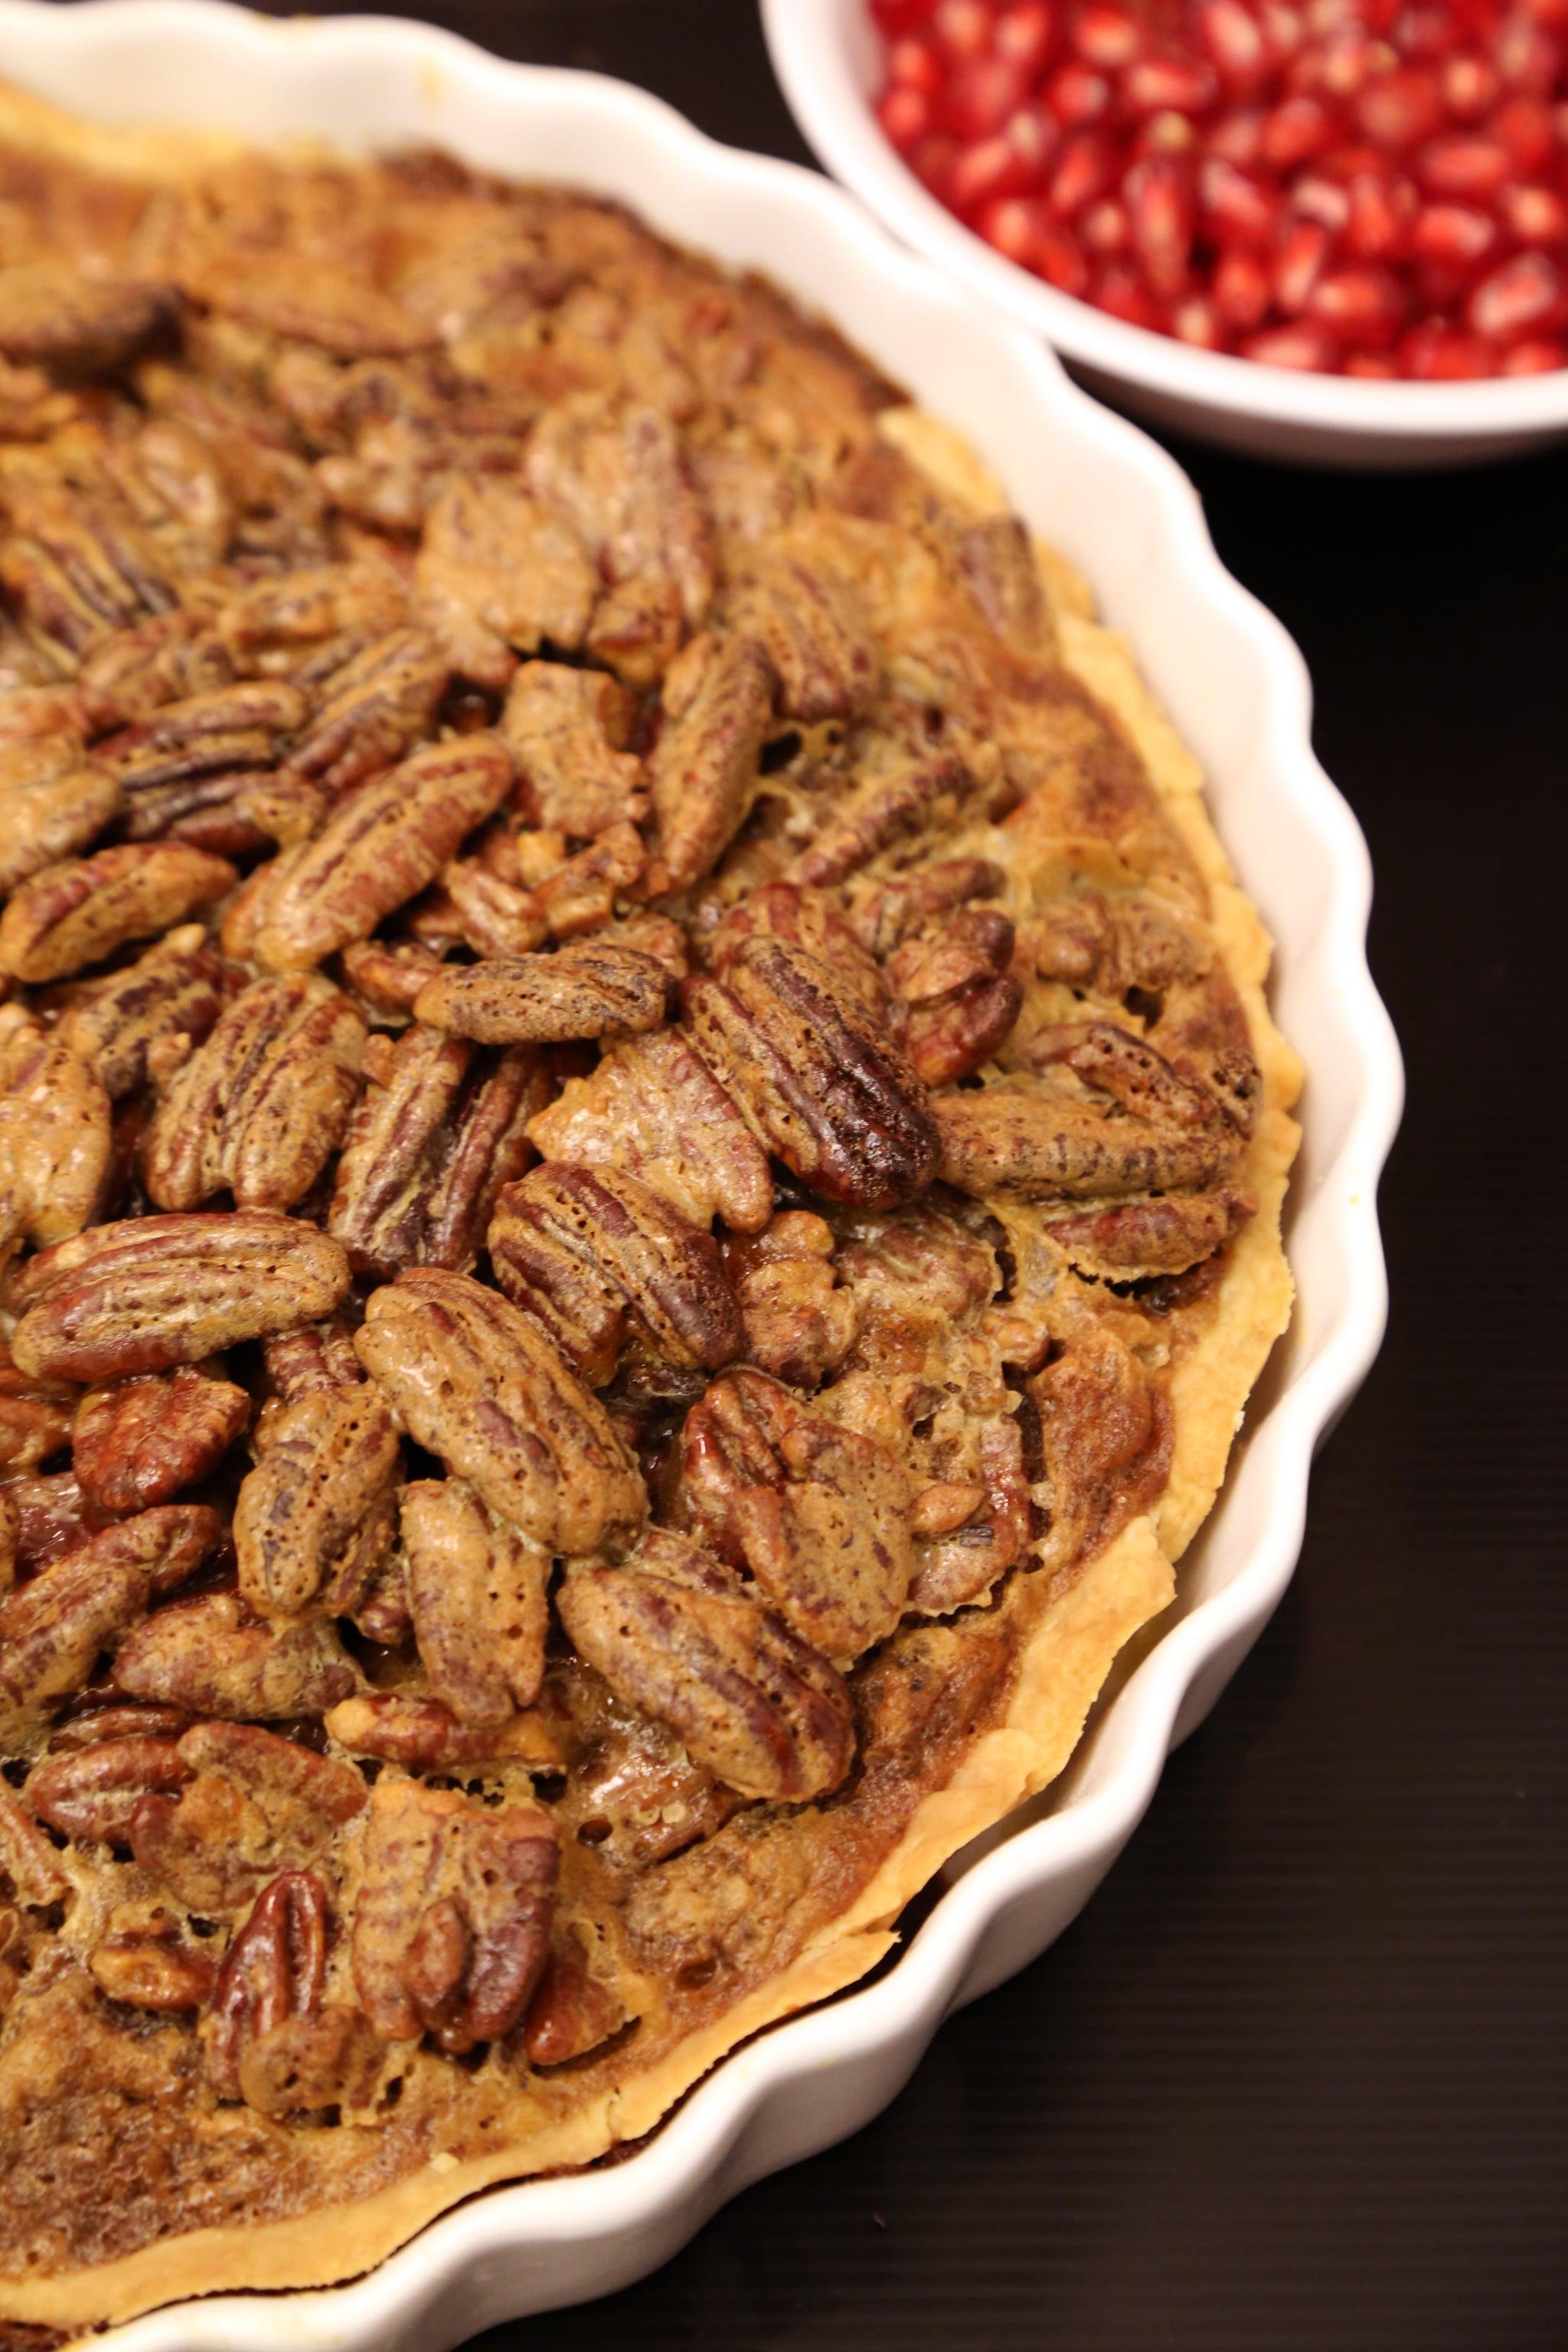 No Corn Syrup, No Problem! Mark Bittman's Trustworthy Pecan Pie Recipe